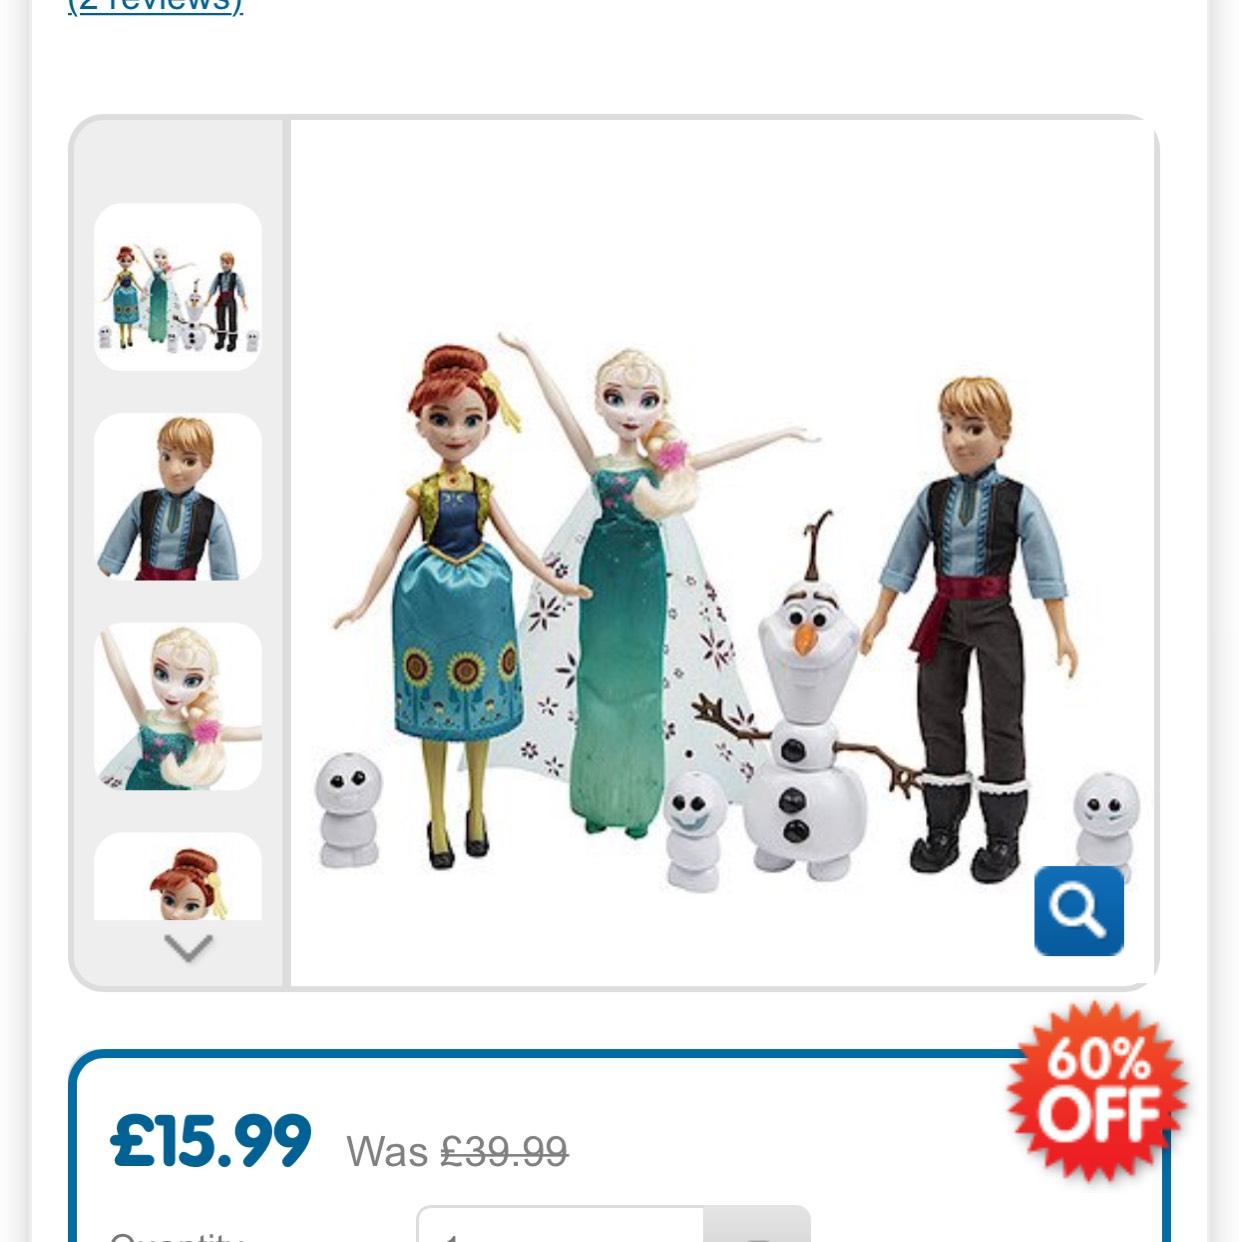 Frozen fever gift set 60% off @ entertainer now £15.99